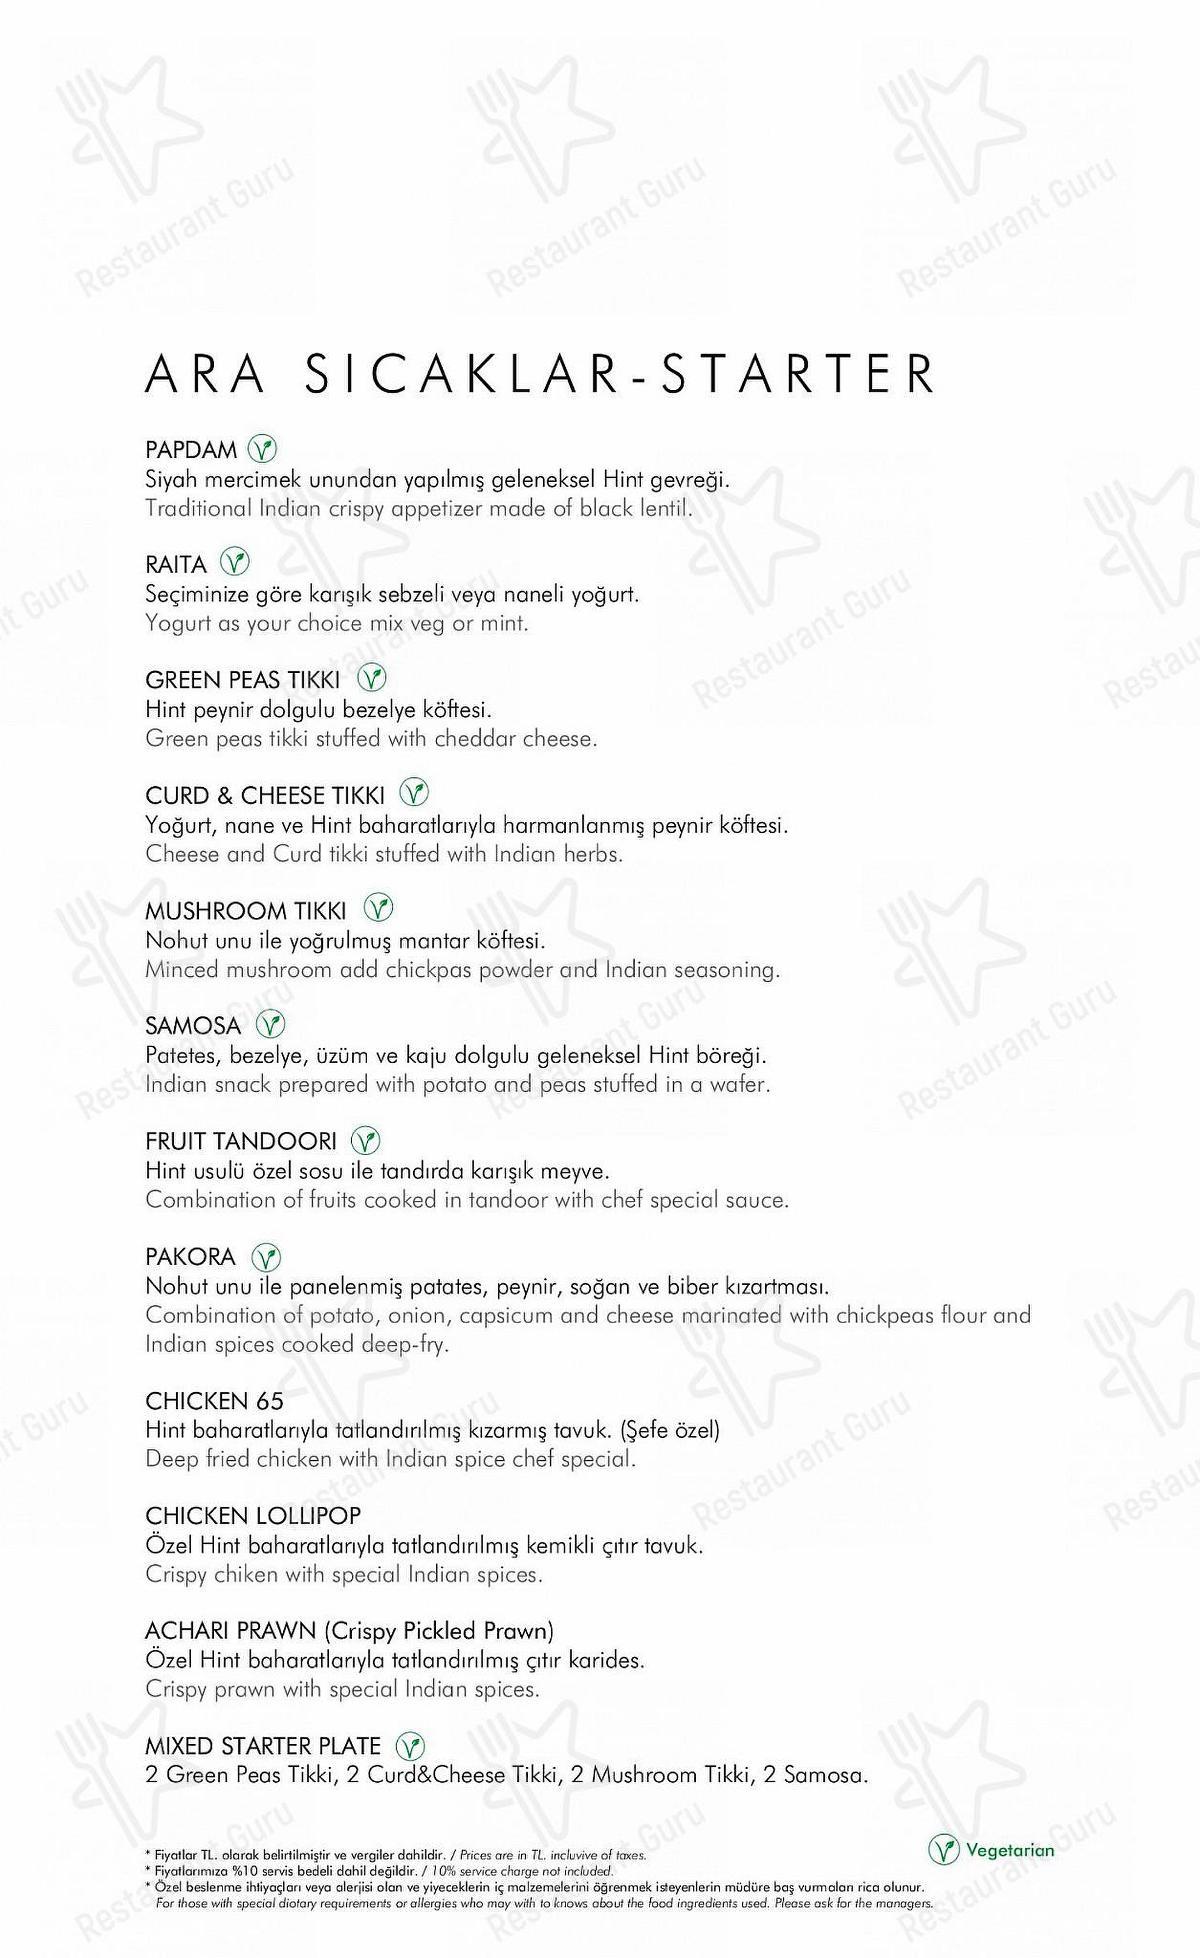 Меню Dubb Indian Bosphorus Restaurant - еда и напитки